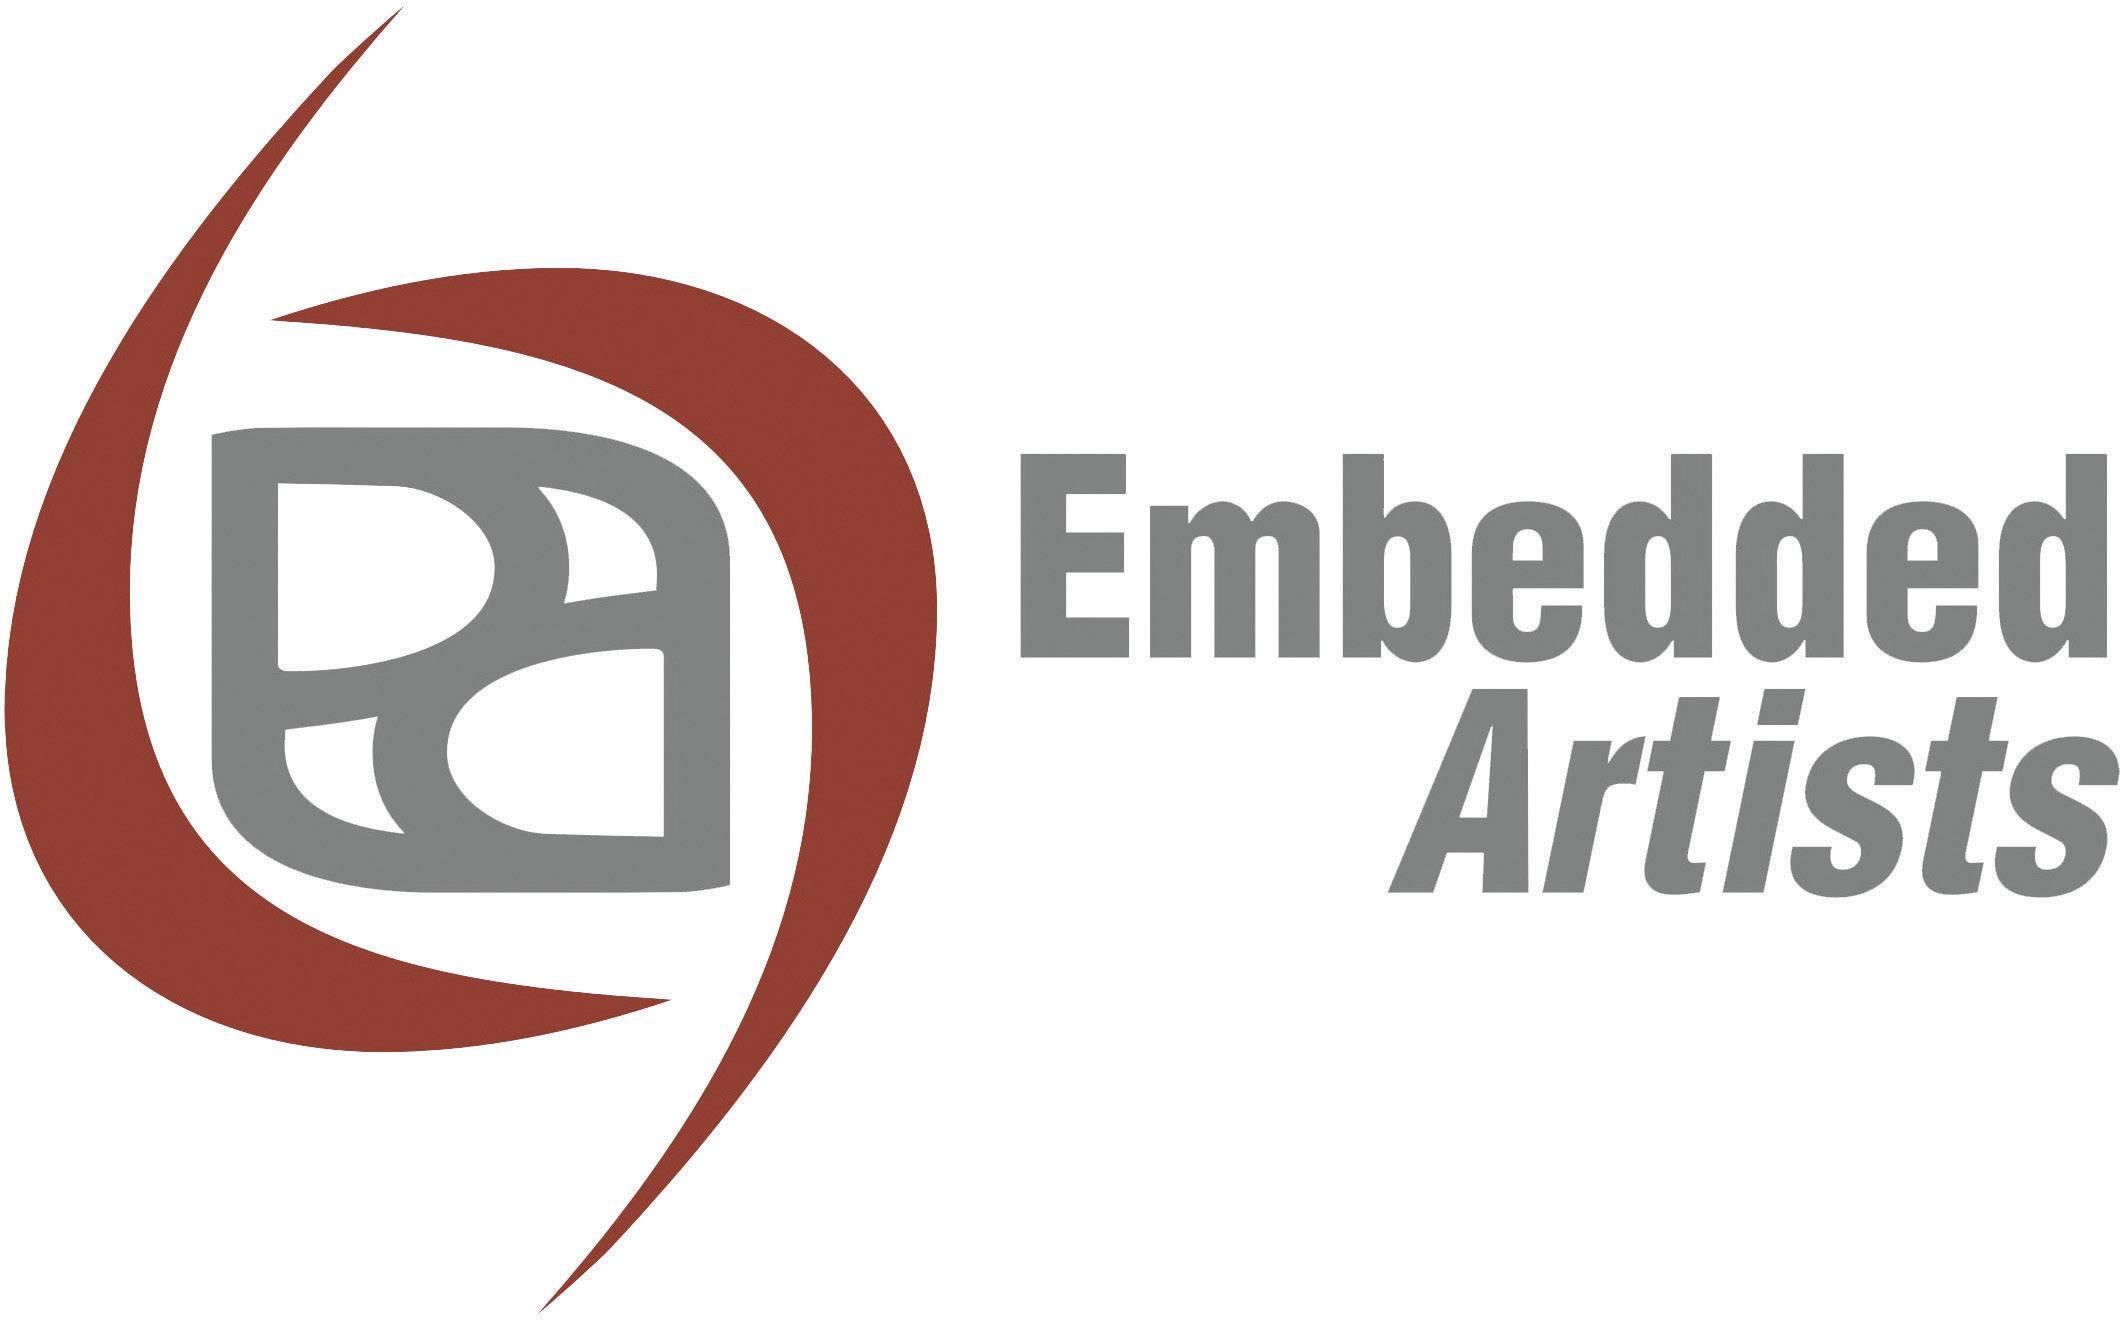 Embedded Artists